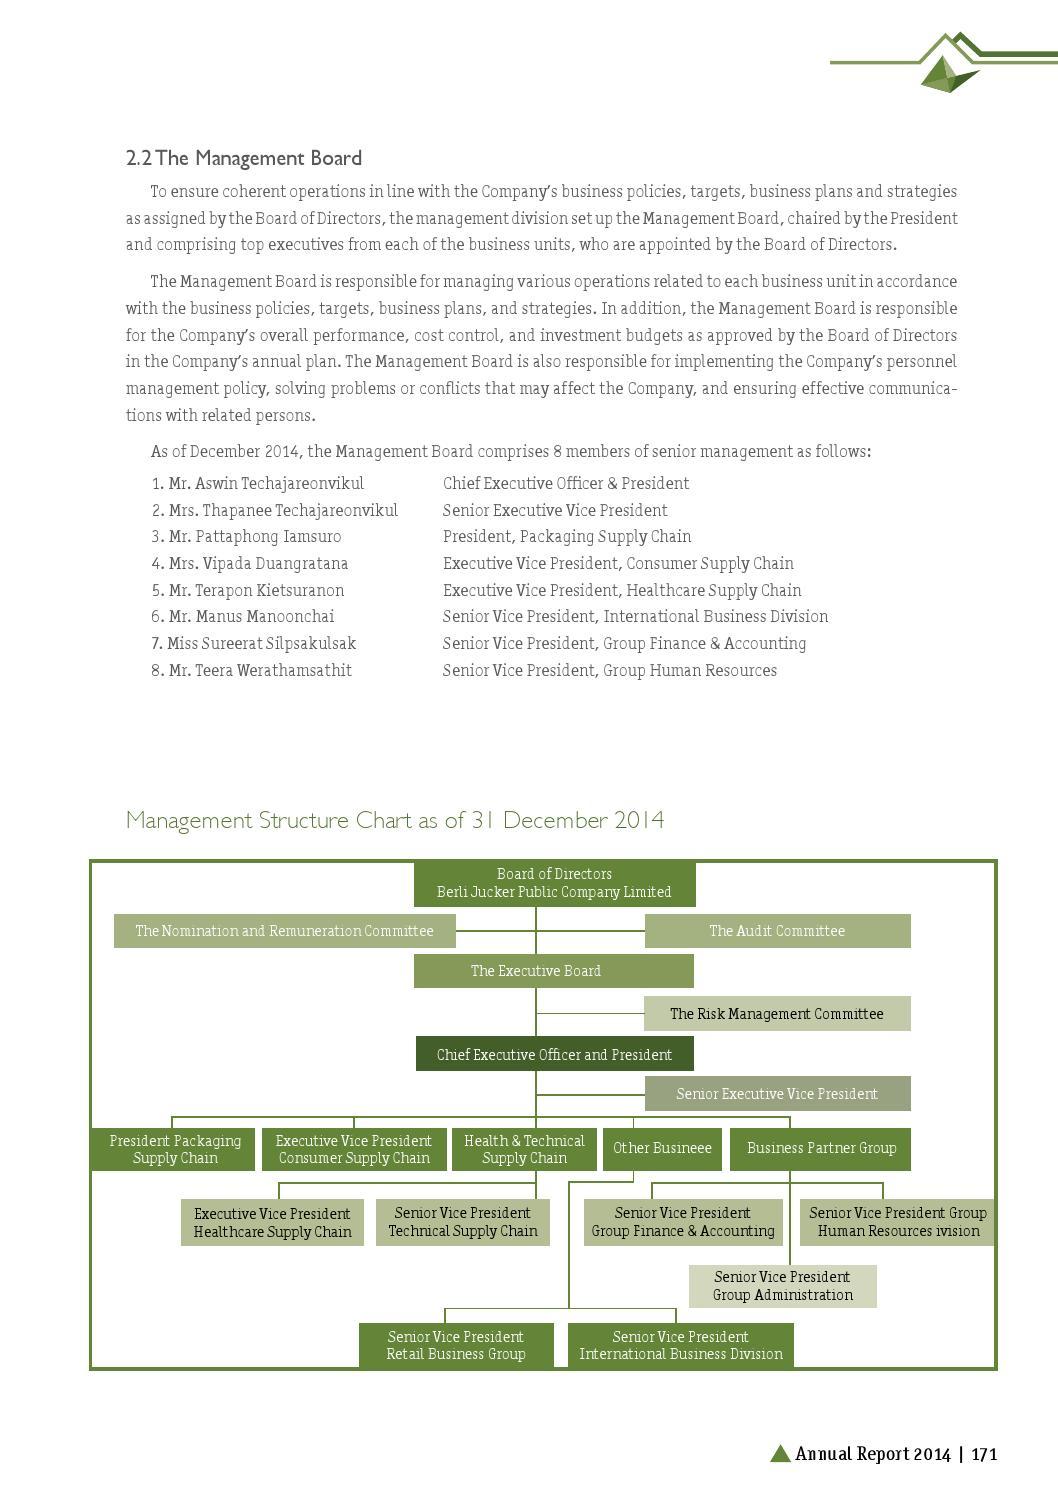 BJC: Annual Report 2014 TH by parama r wichai - issuu